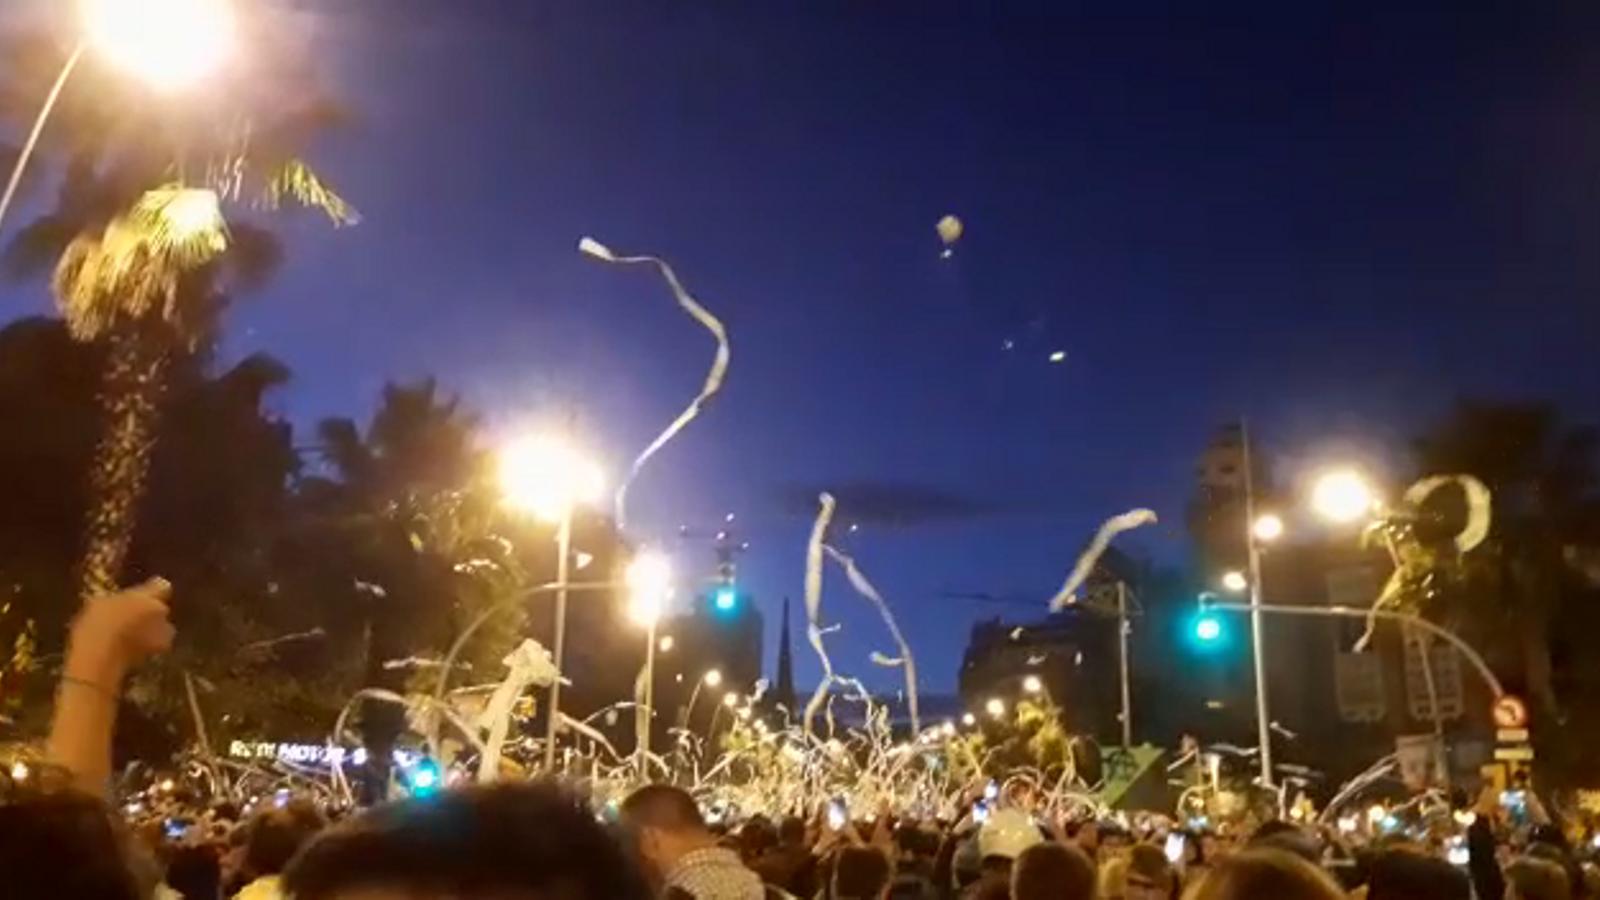 Els manifestants llancen paper de vàter enlaire